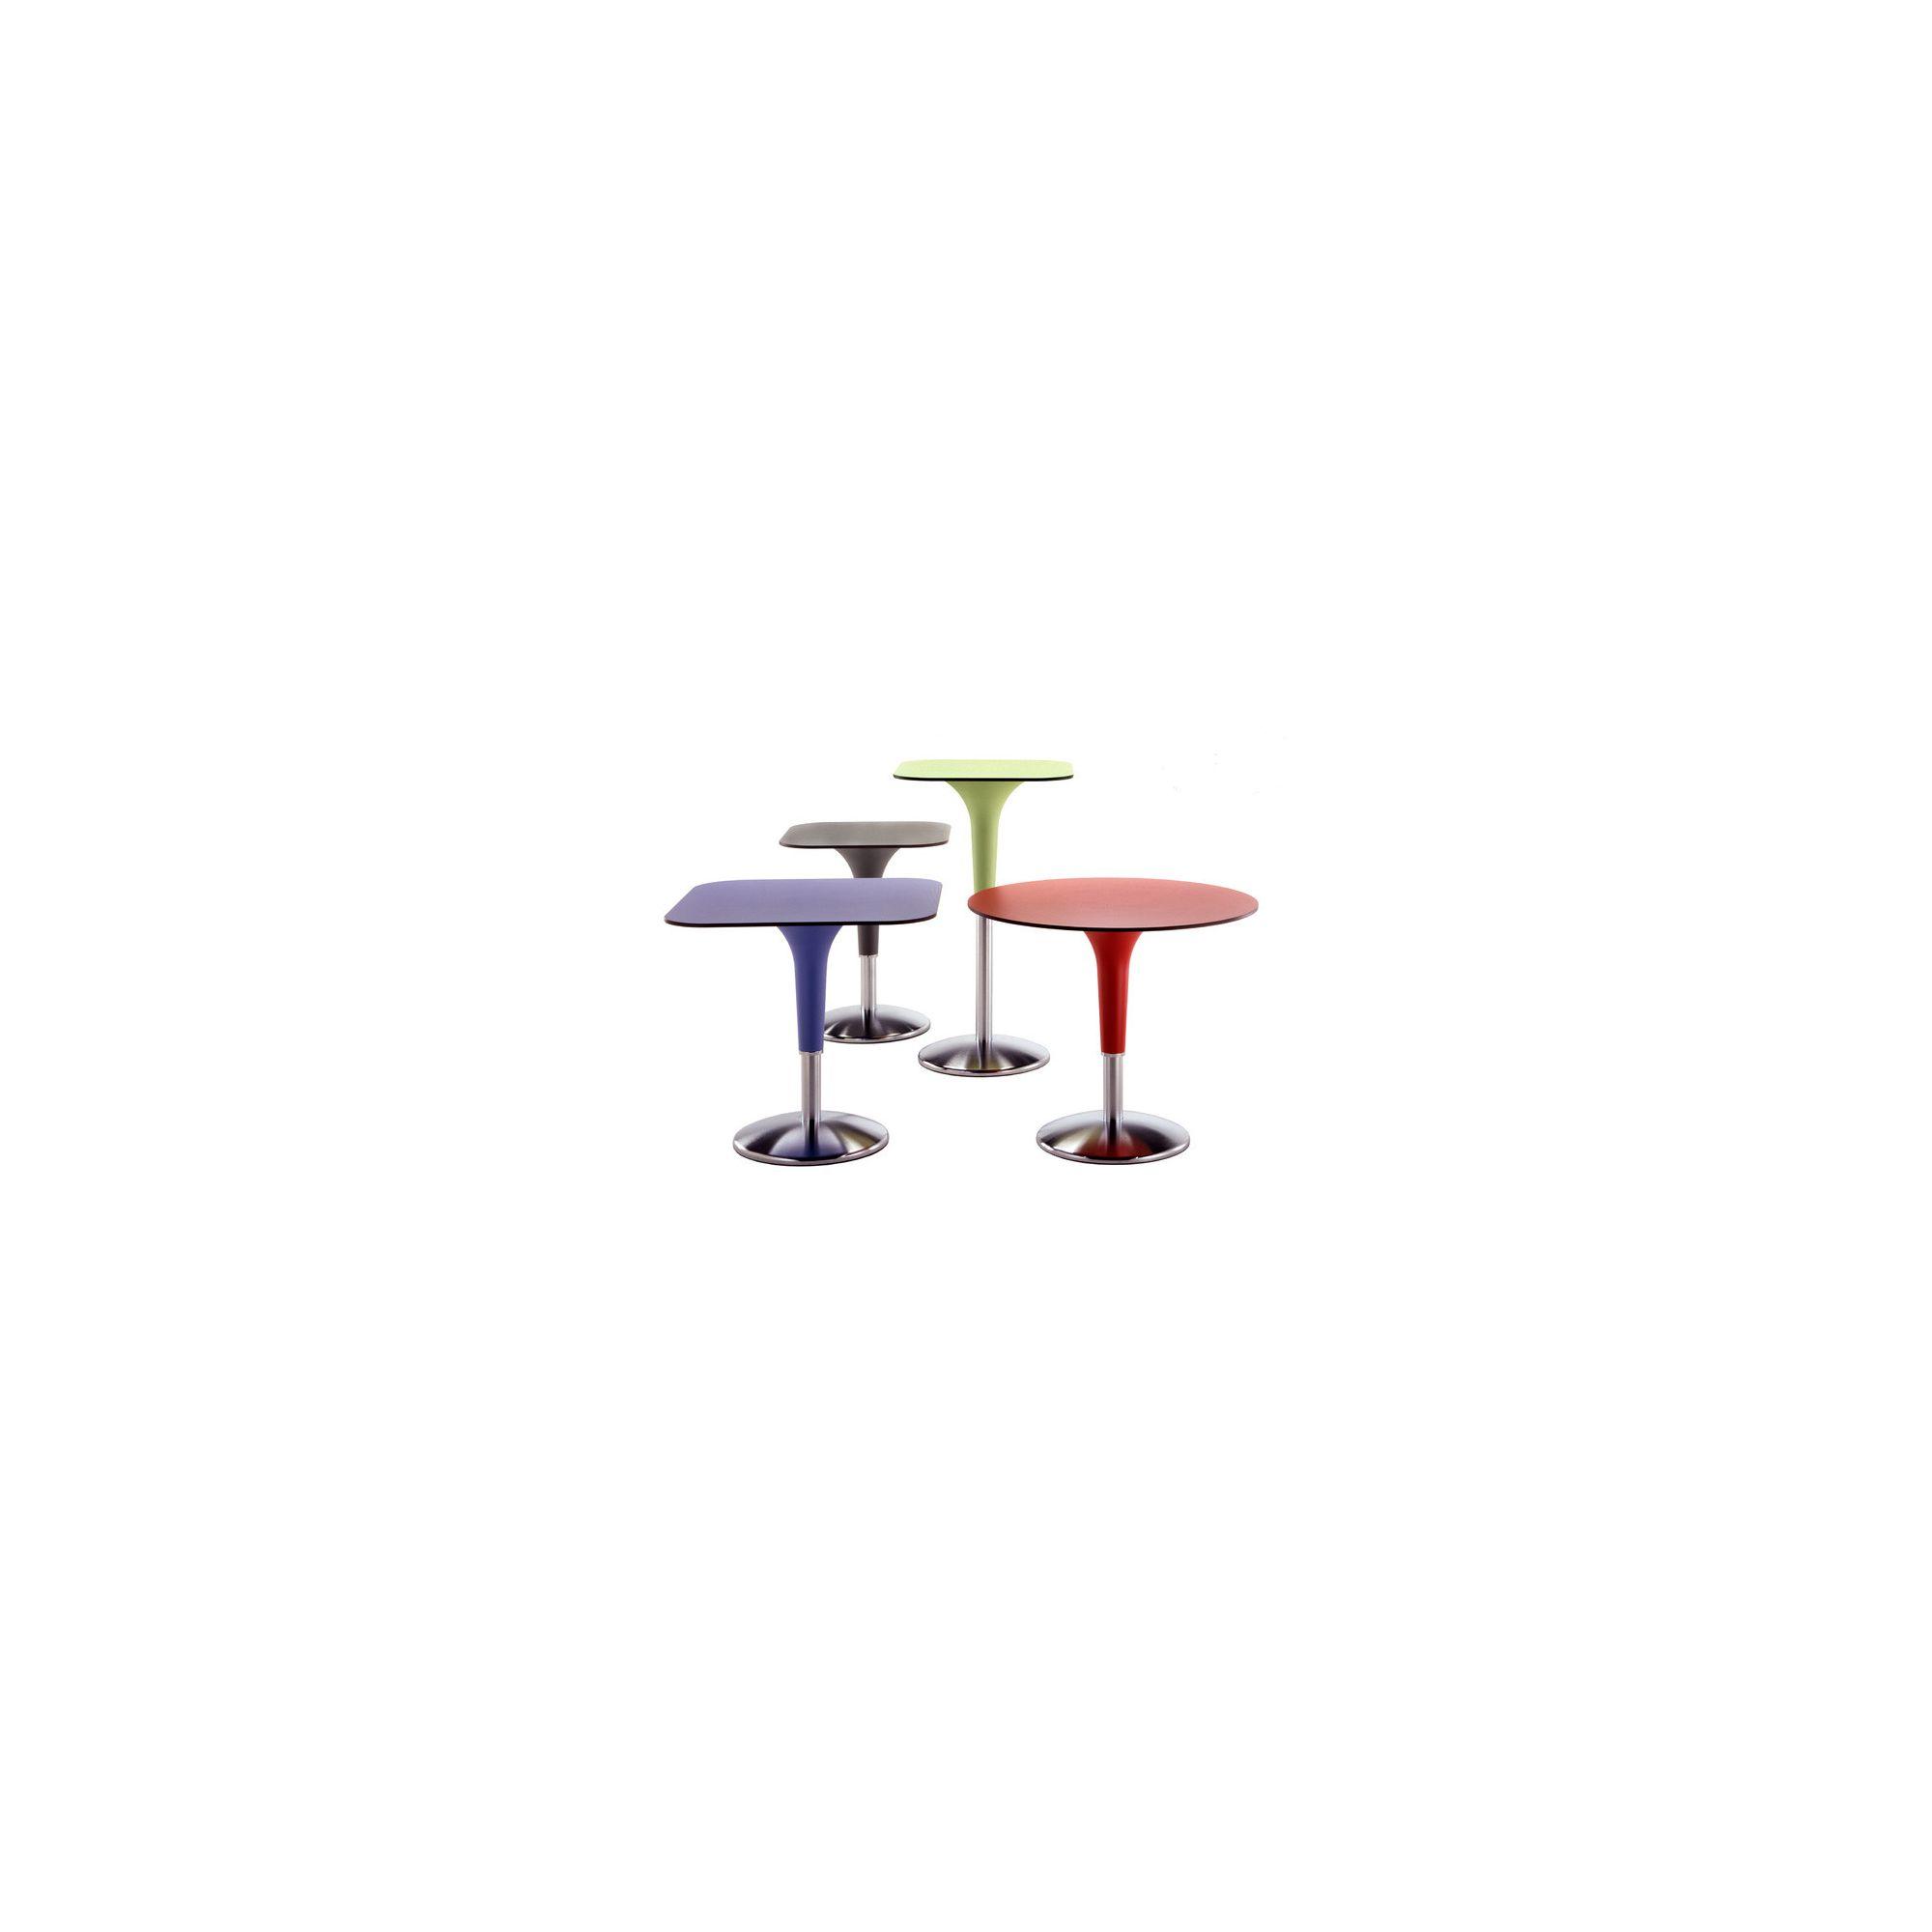 Rexite Zanziplano Round Table - 90cm x 105cm - Red at Tesco Direct